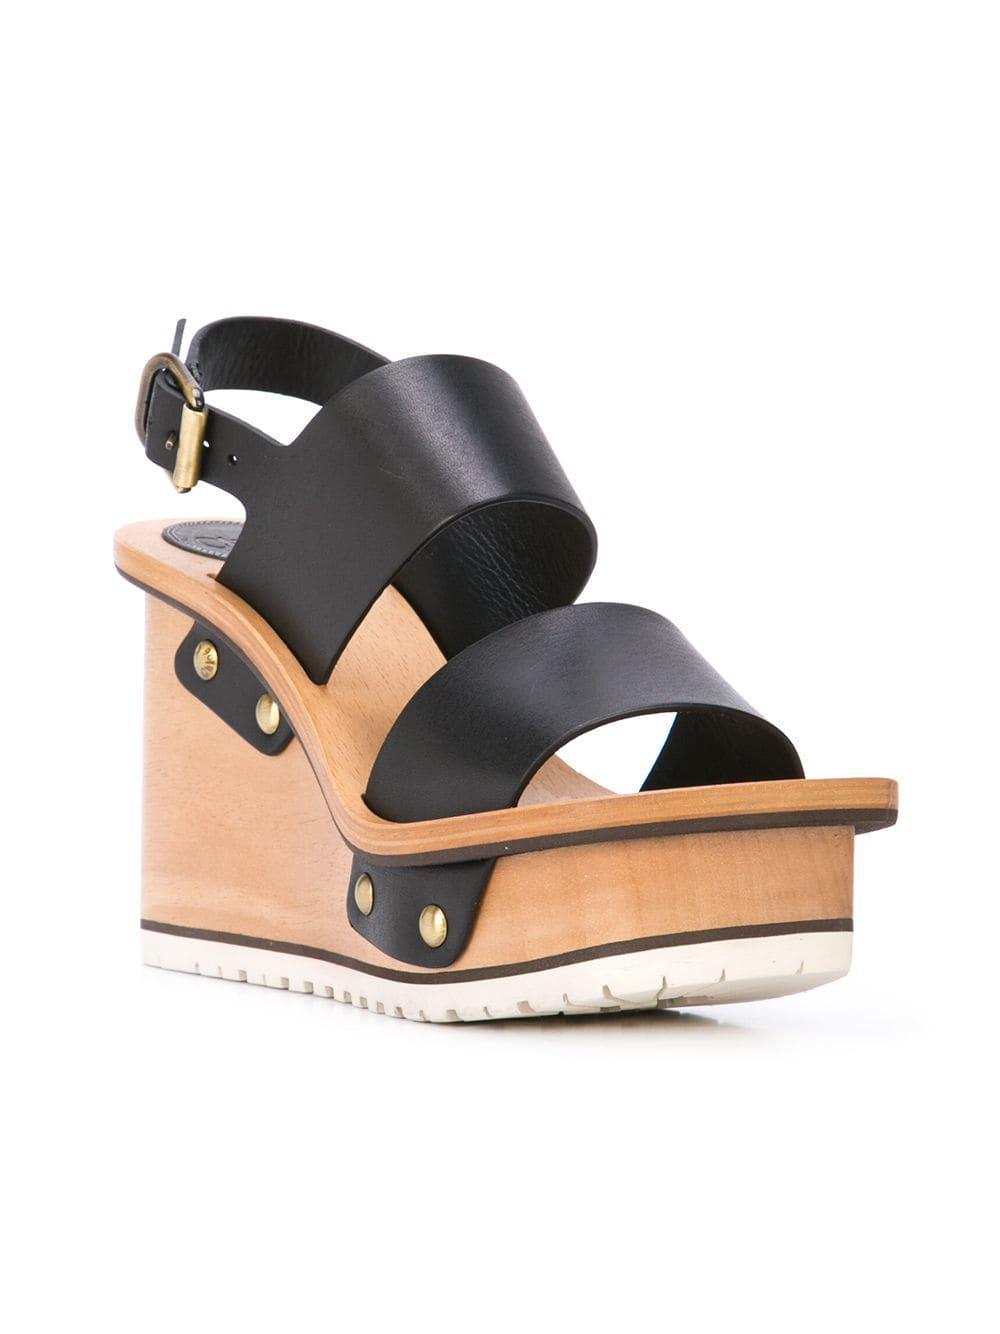 Sandals High Black In Chloé Lyst Wedge Heel B6g7yfyv wXuPZiOkT